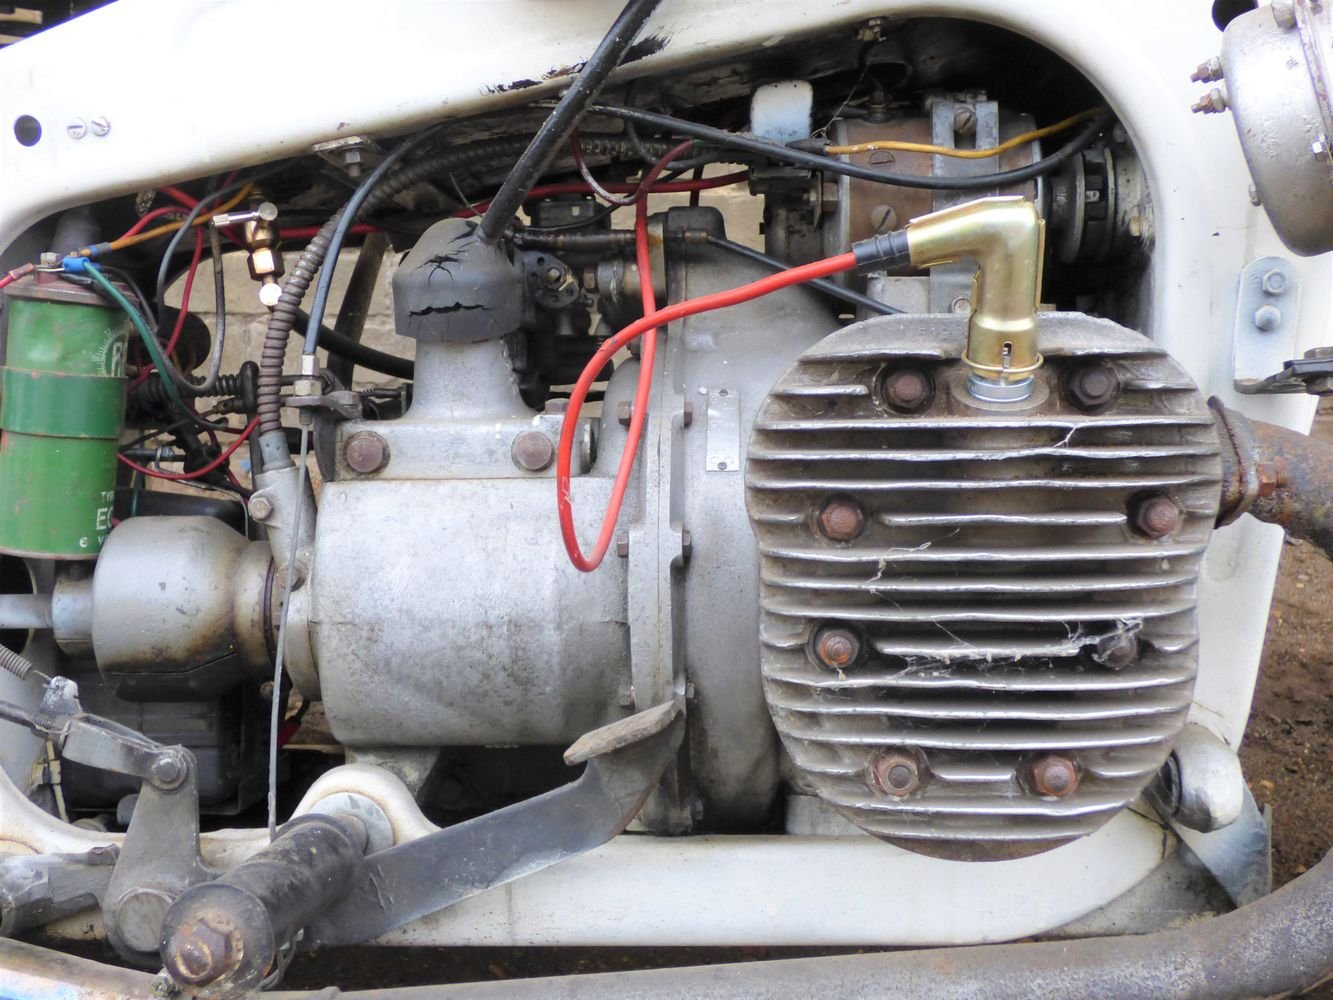 1940 1958 Gnome & Rhone AX2 800cc SOLD (picture 3 of 6)